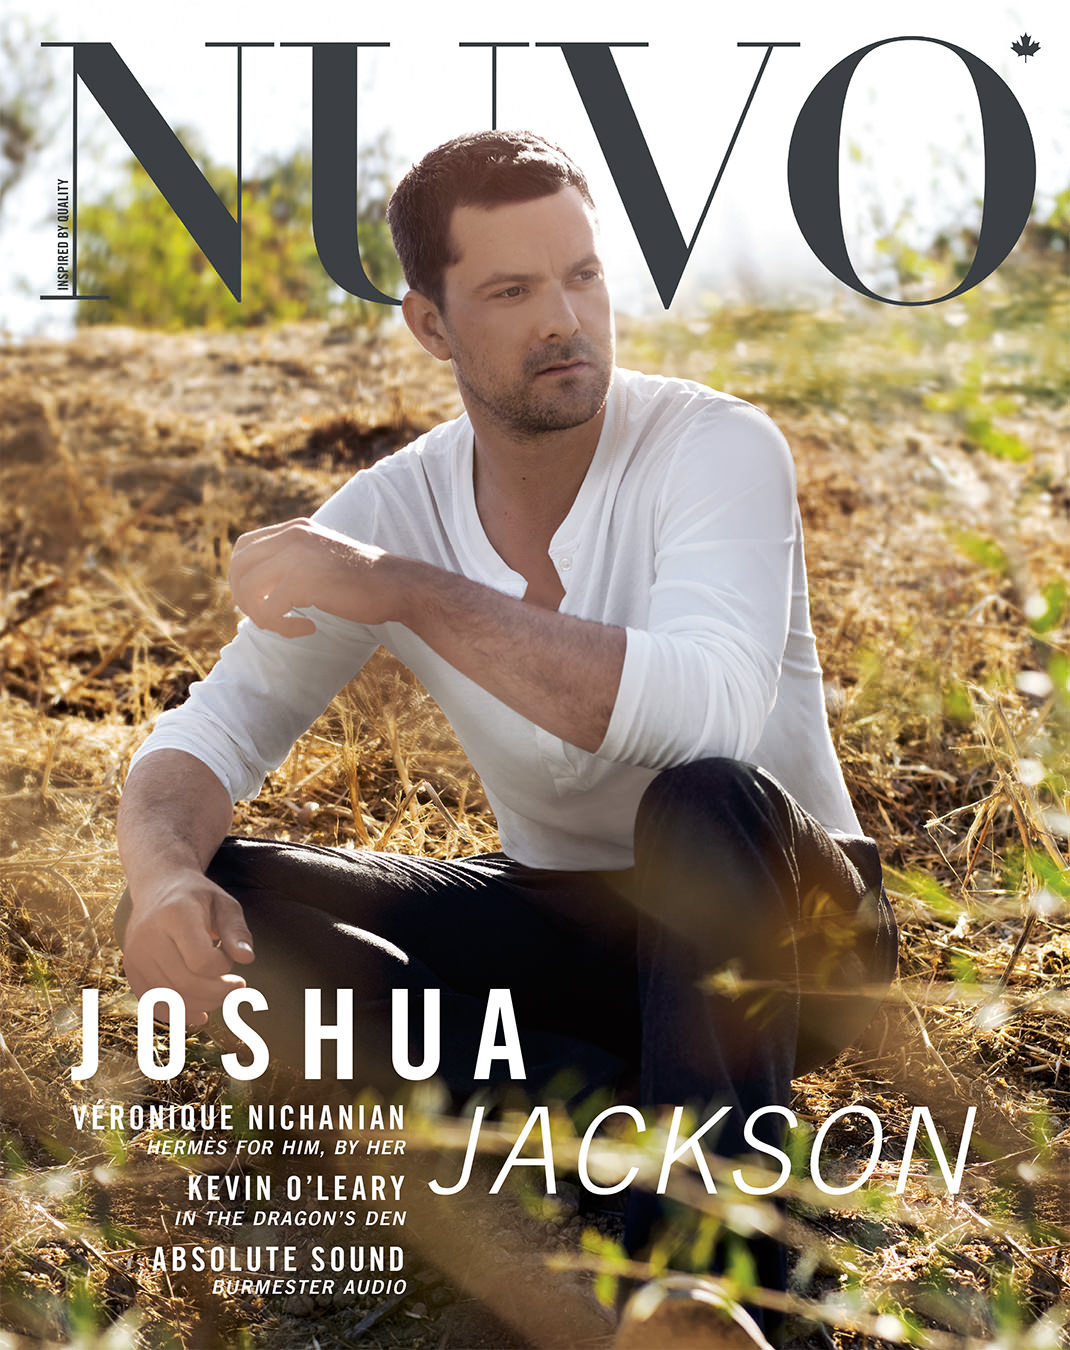 NUVO Magazine Autumn 2010 Cover featuring Joshua Jackson